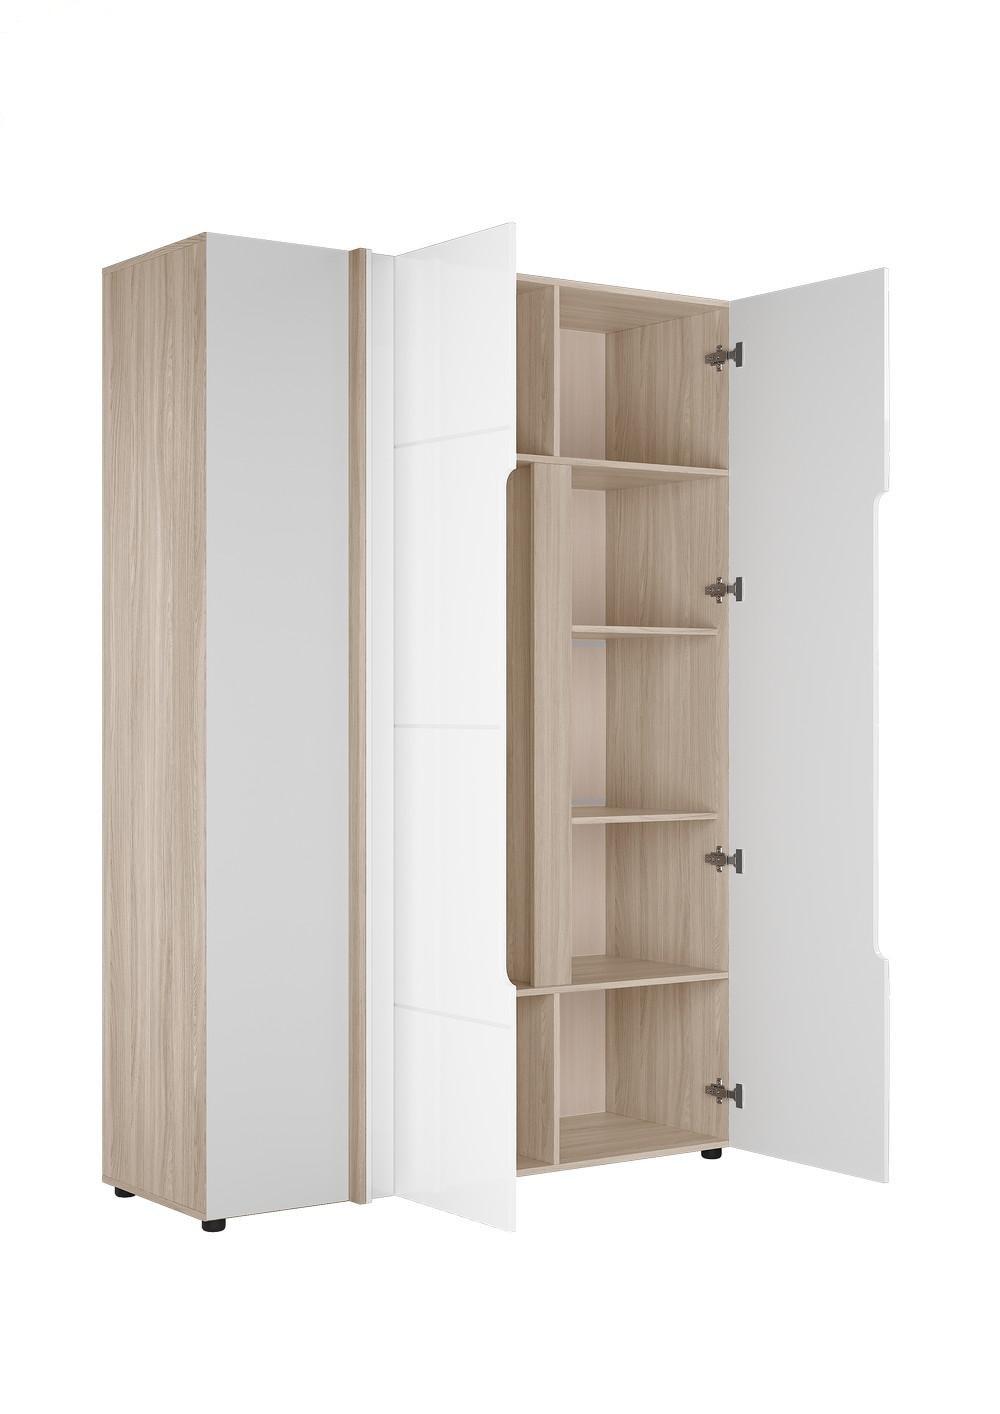 Палермо 3 Шкаф угловой 90 от магазина Мебелол